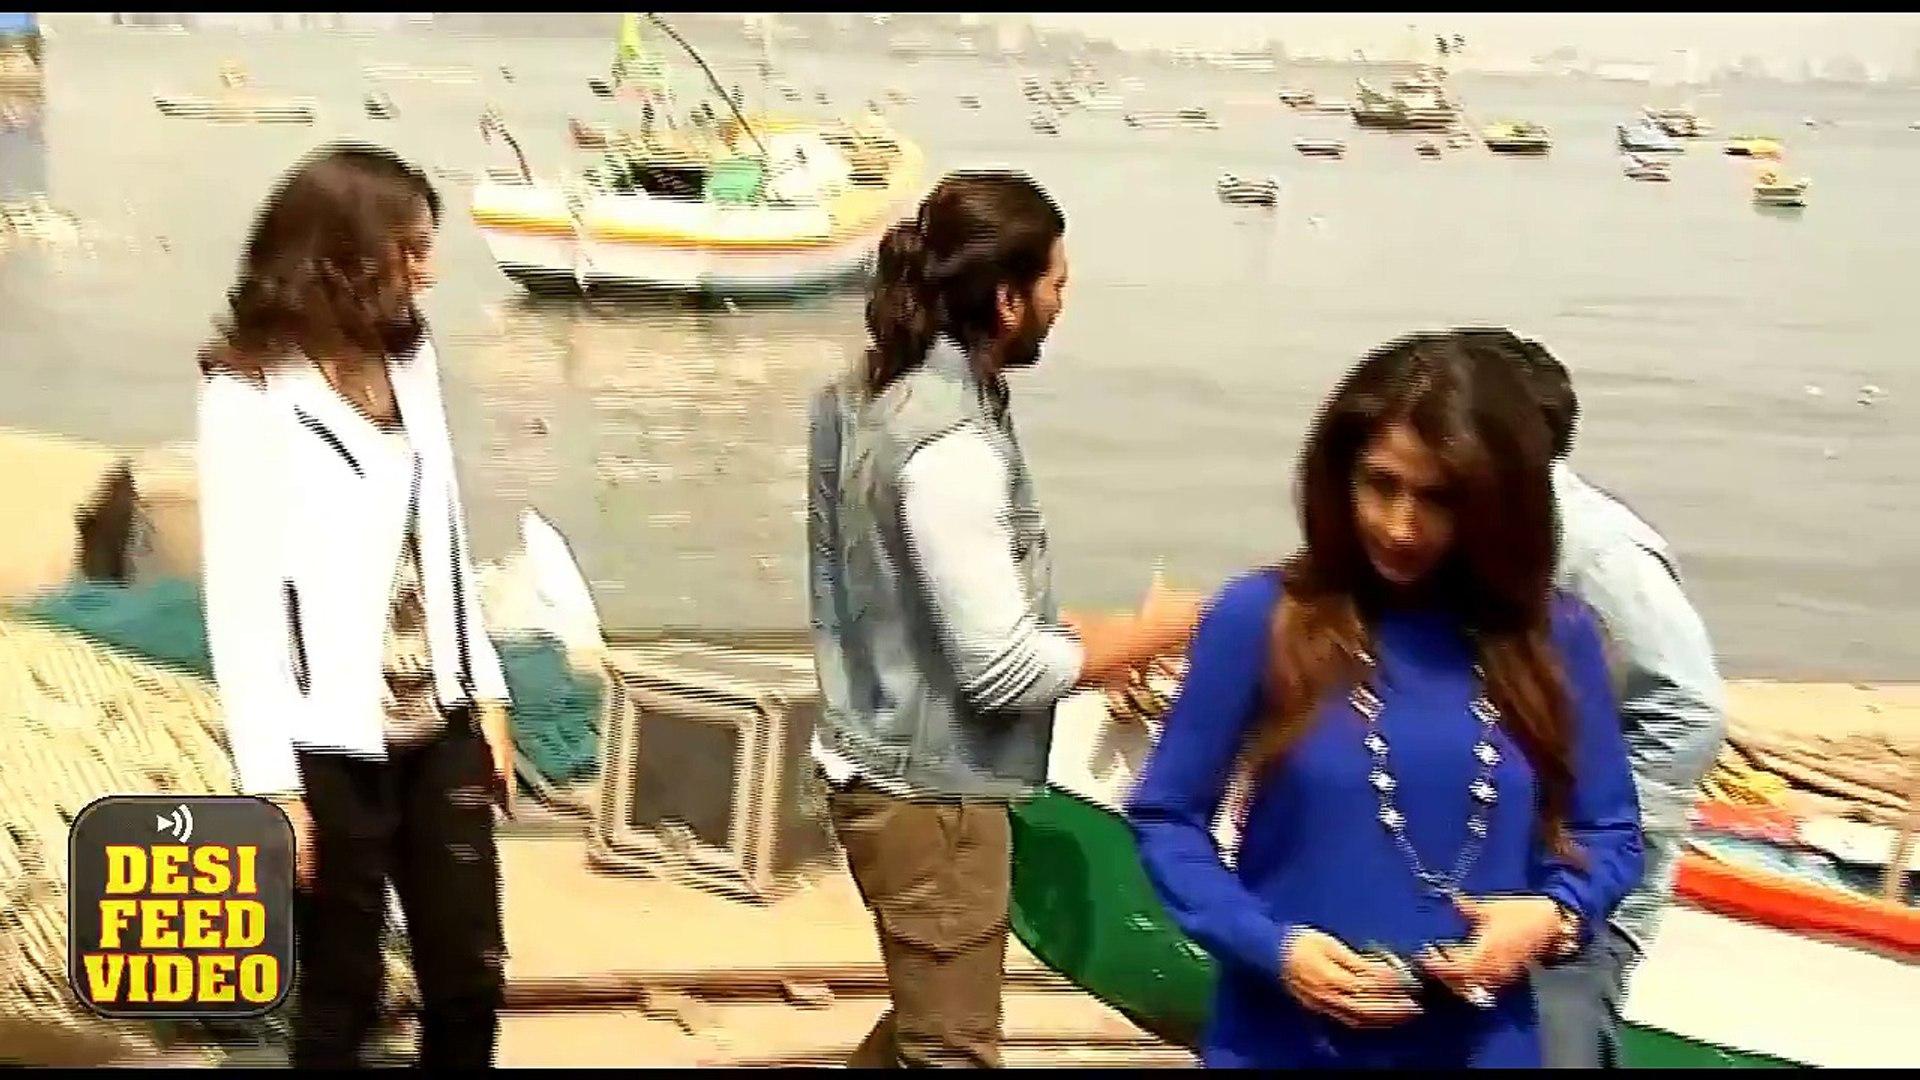 Banjo Hindi Movie 2016 | Ritesh Deshmukh, Nargis Fakhri | Shoot Begins